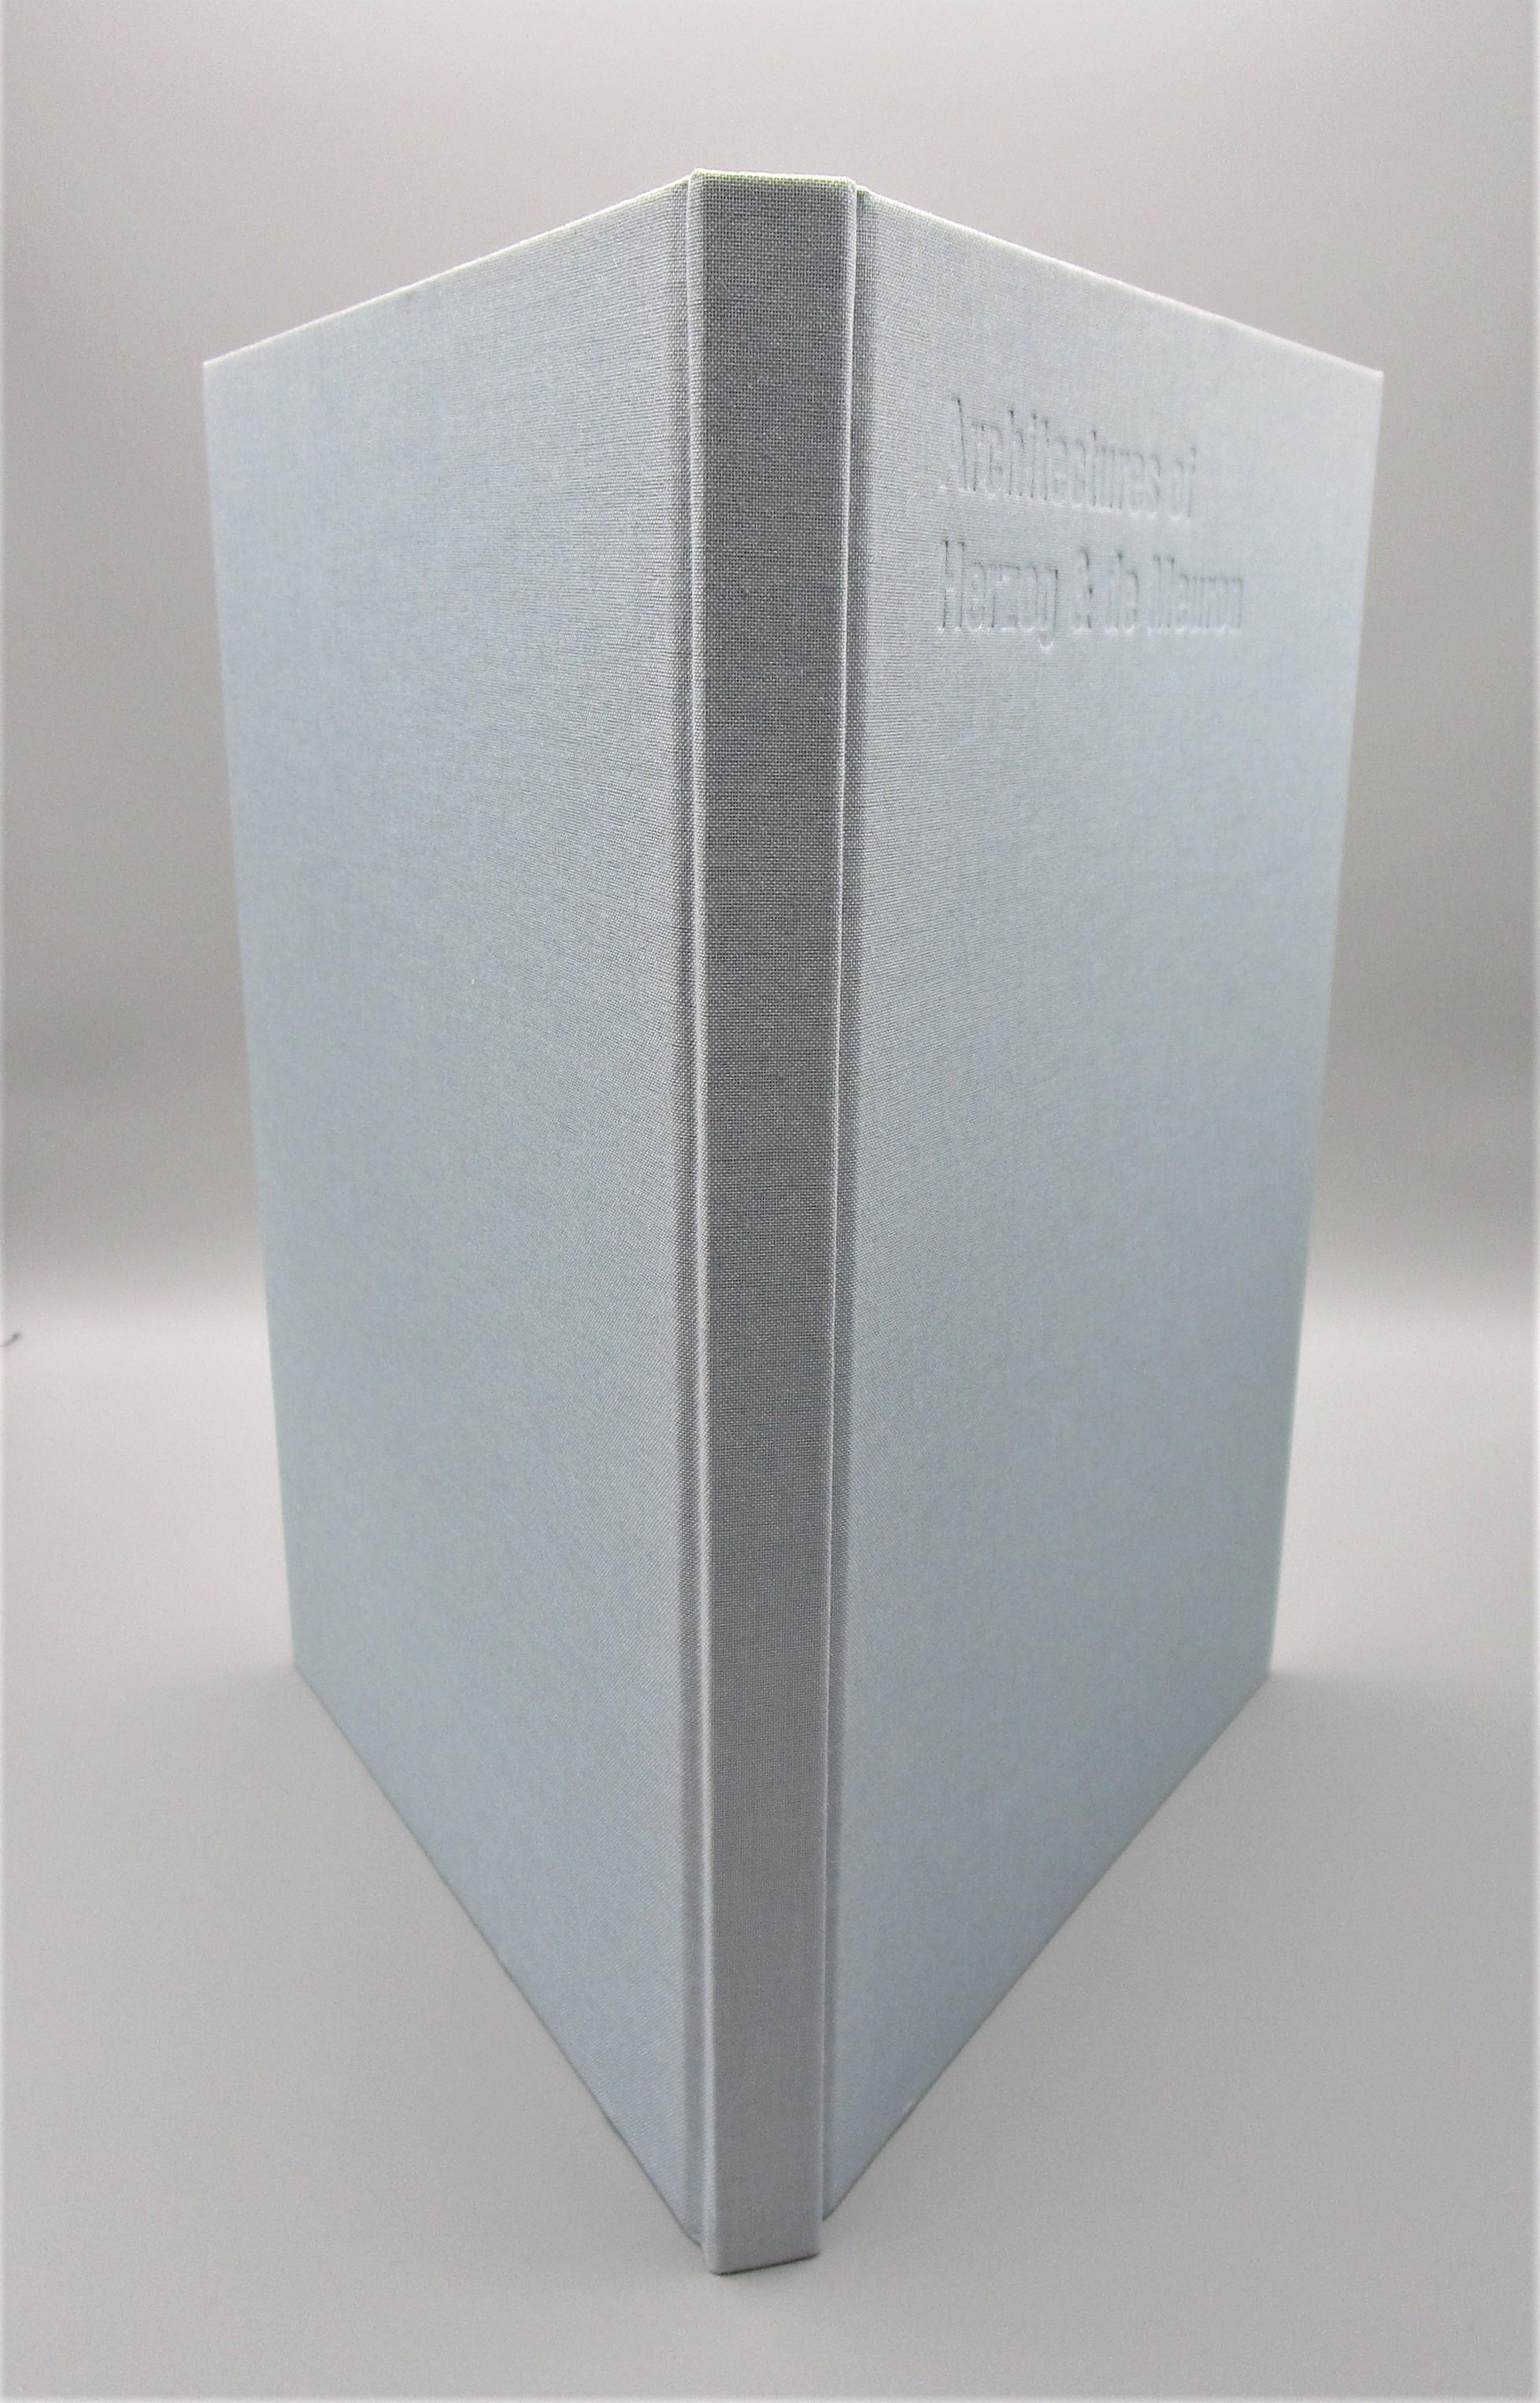 ARCHITECTURES OF HERZOG & DE MEURON, by Thomas Ruff - 1995 [2nd Ed]